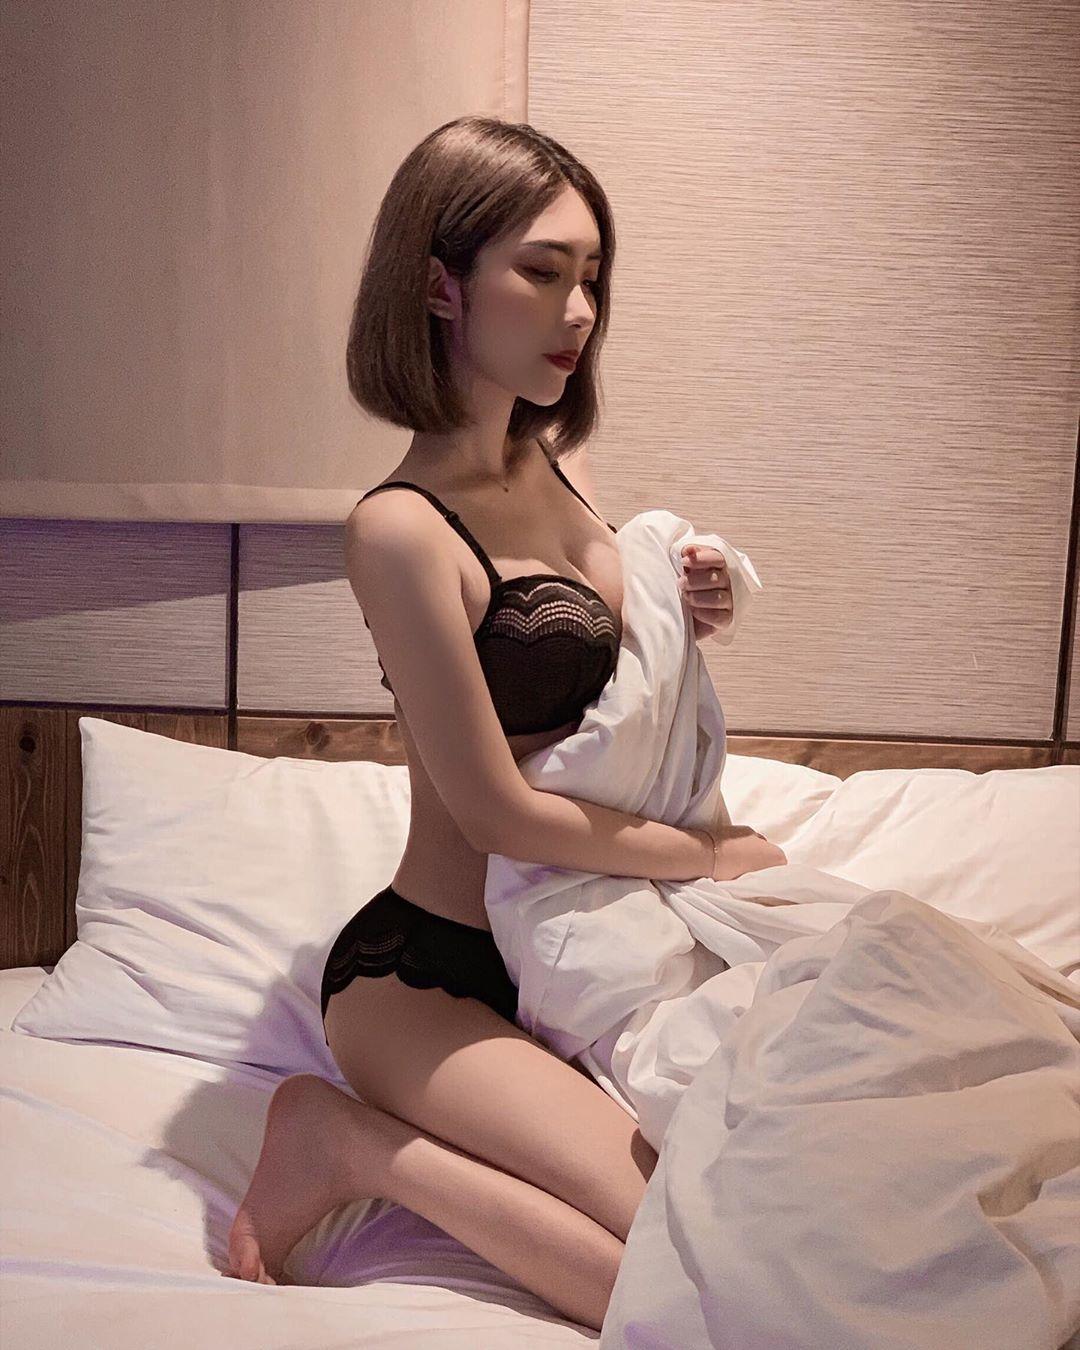 dElt2yP0 o - IG正妹—黃瓊儀